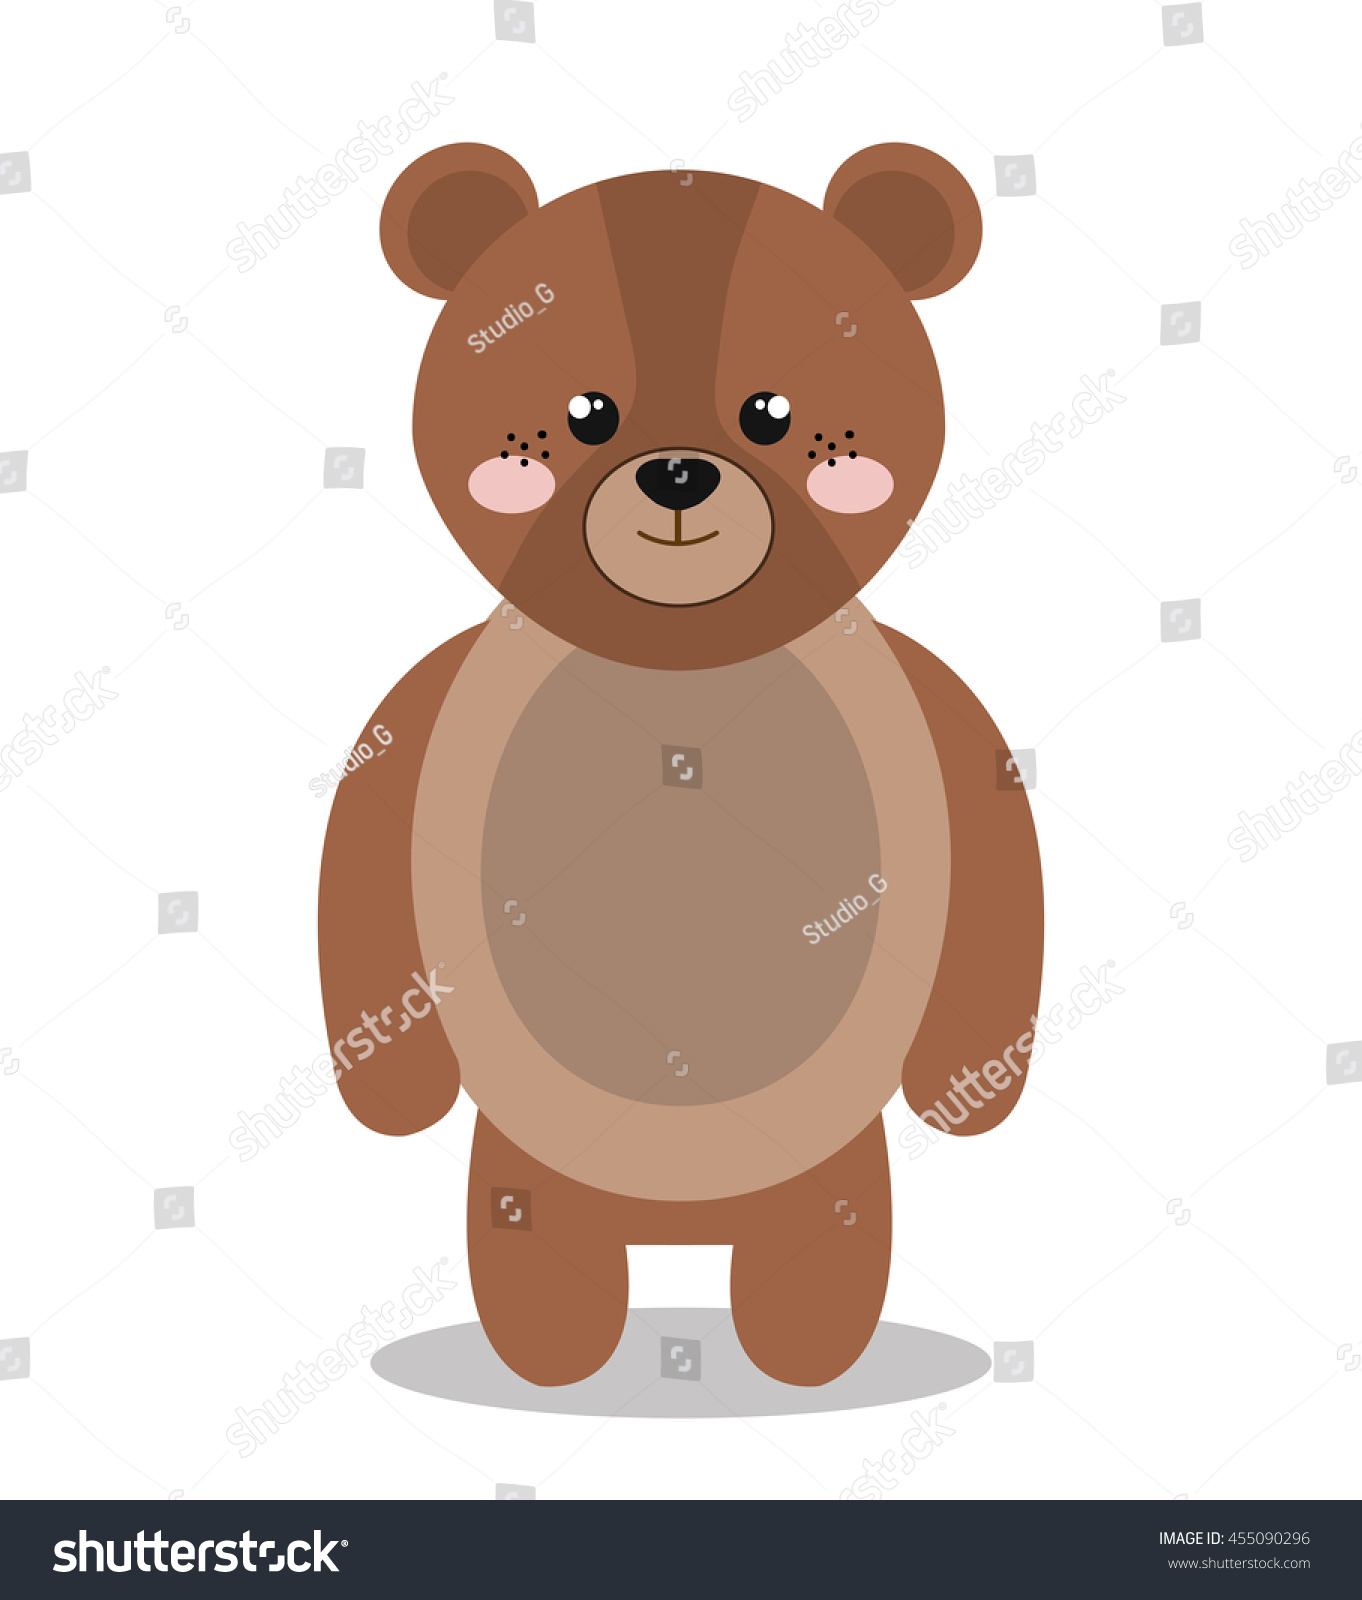 Teddy Bear Graphic Free Do...